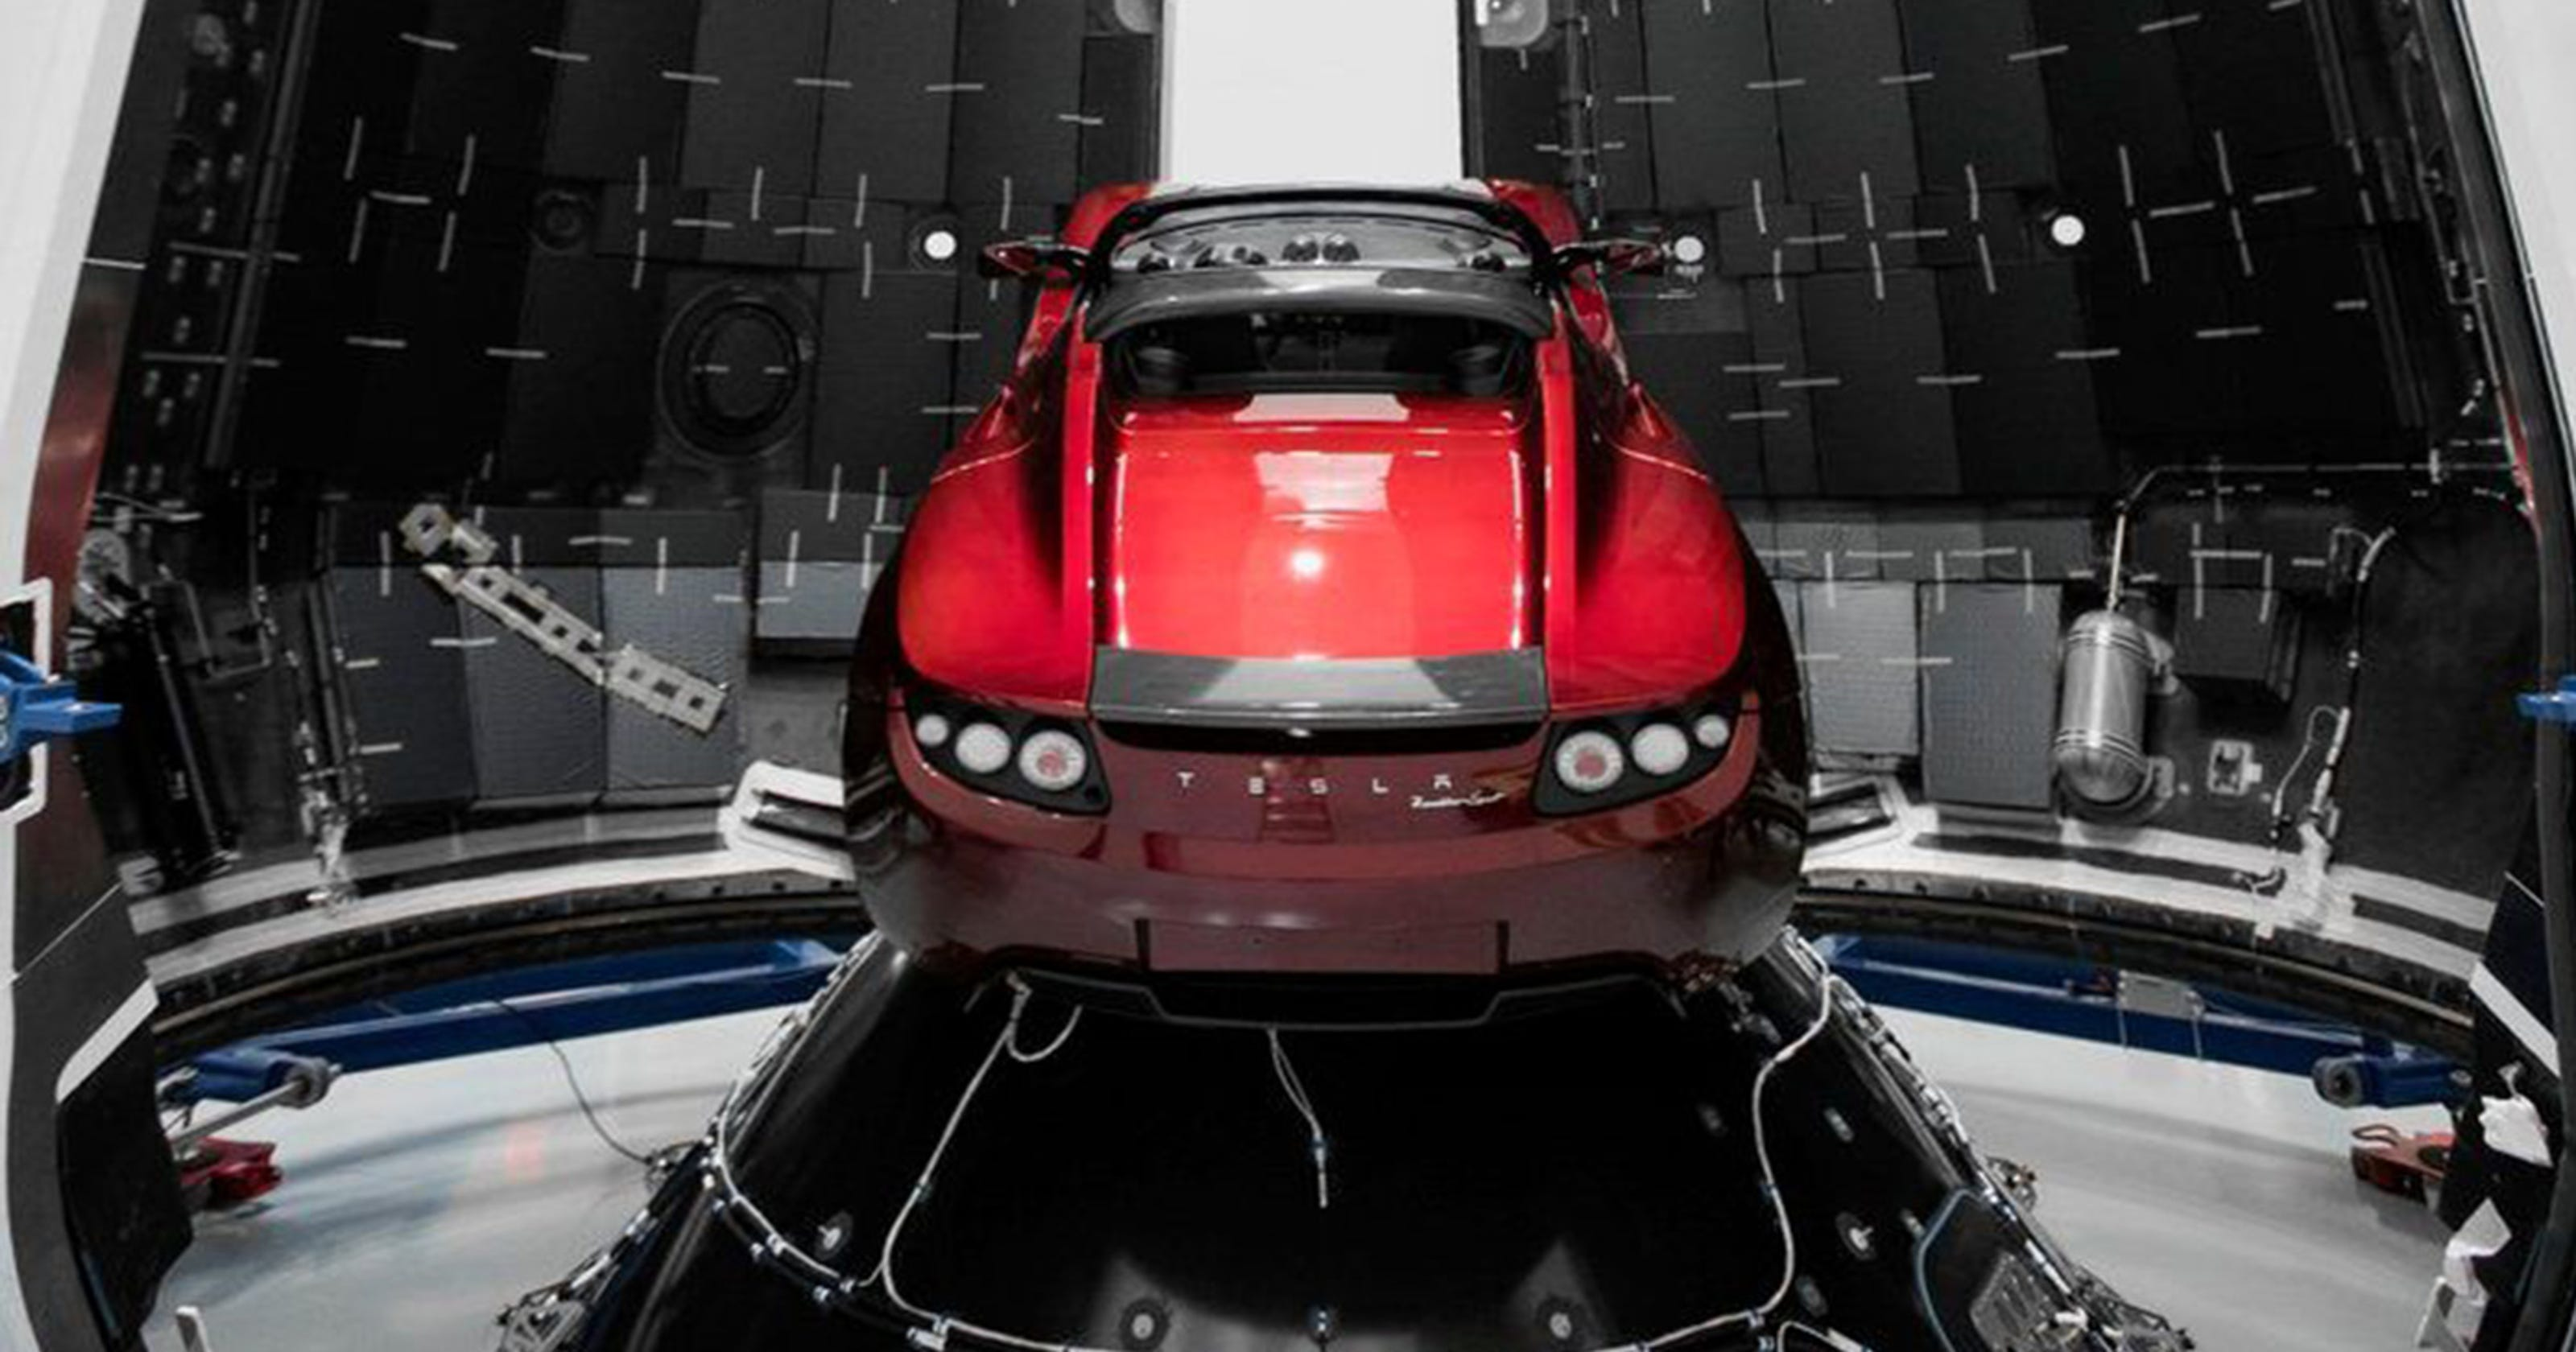 spacex launch elon musk reveals red tesla roadster bound for mars. Black Bedroom Furniture Sets. Home Design Ideas